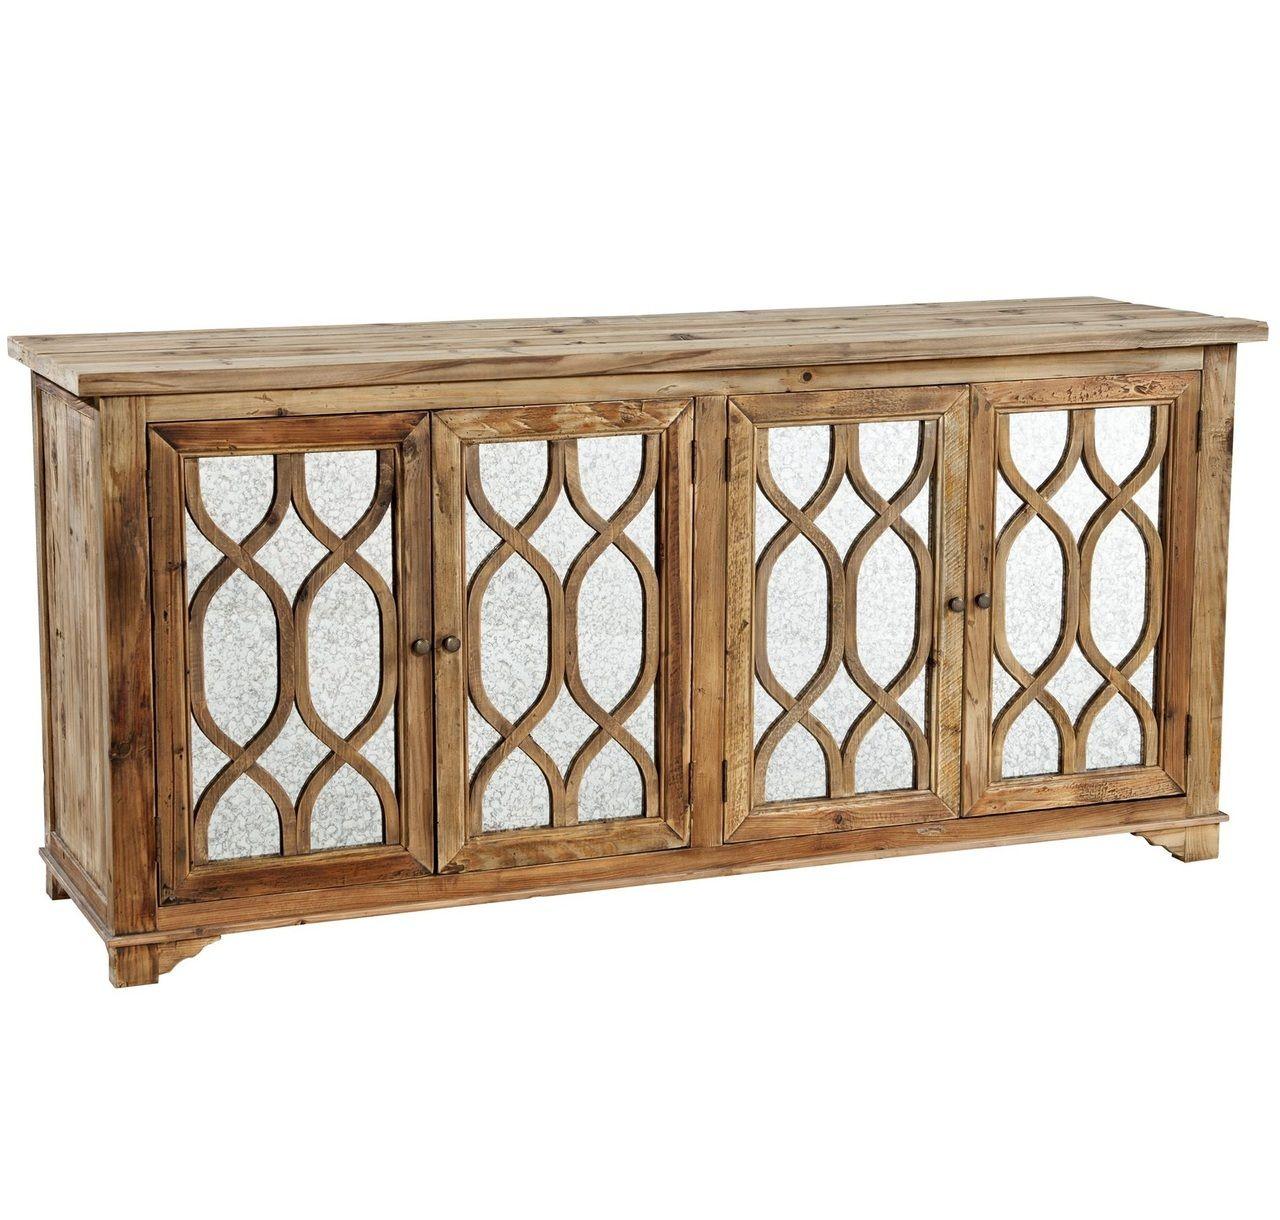 French Lattice Reclaimed Wood 4 Door Mirrored Sideboard In